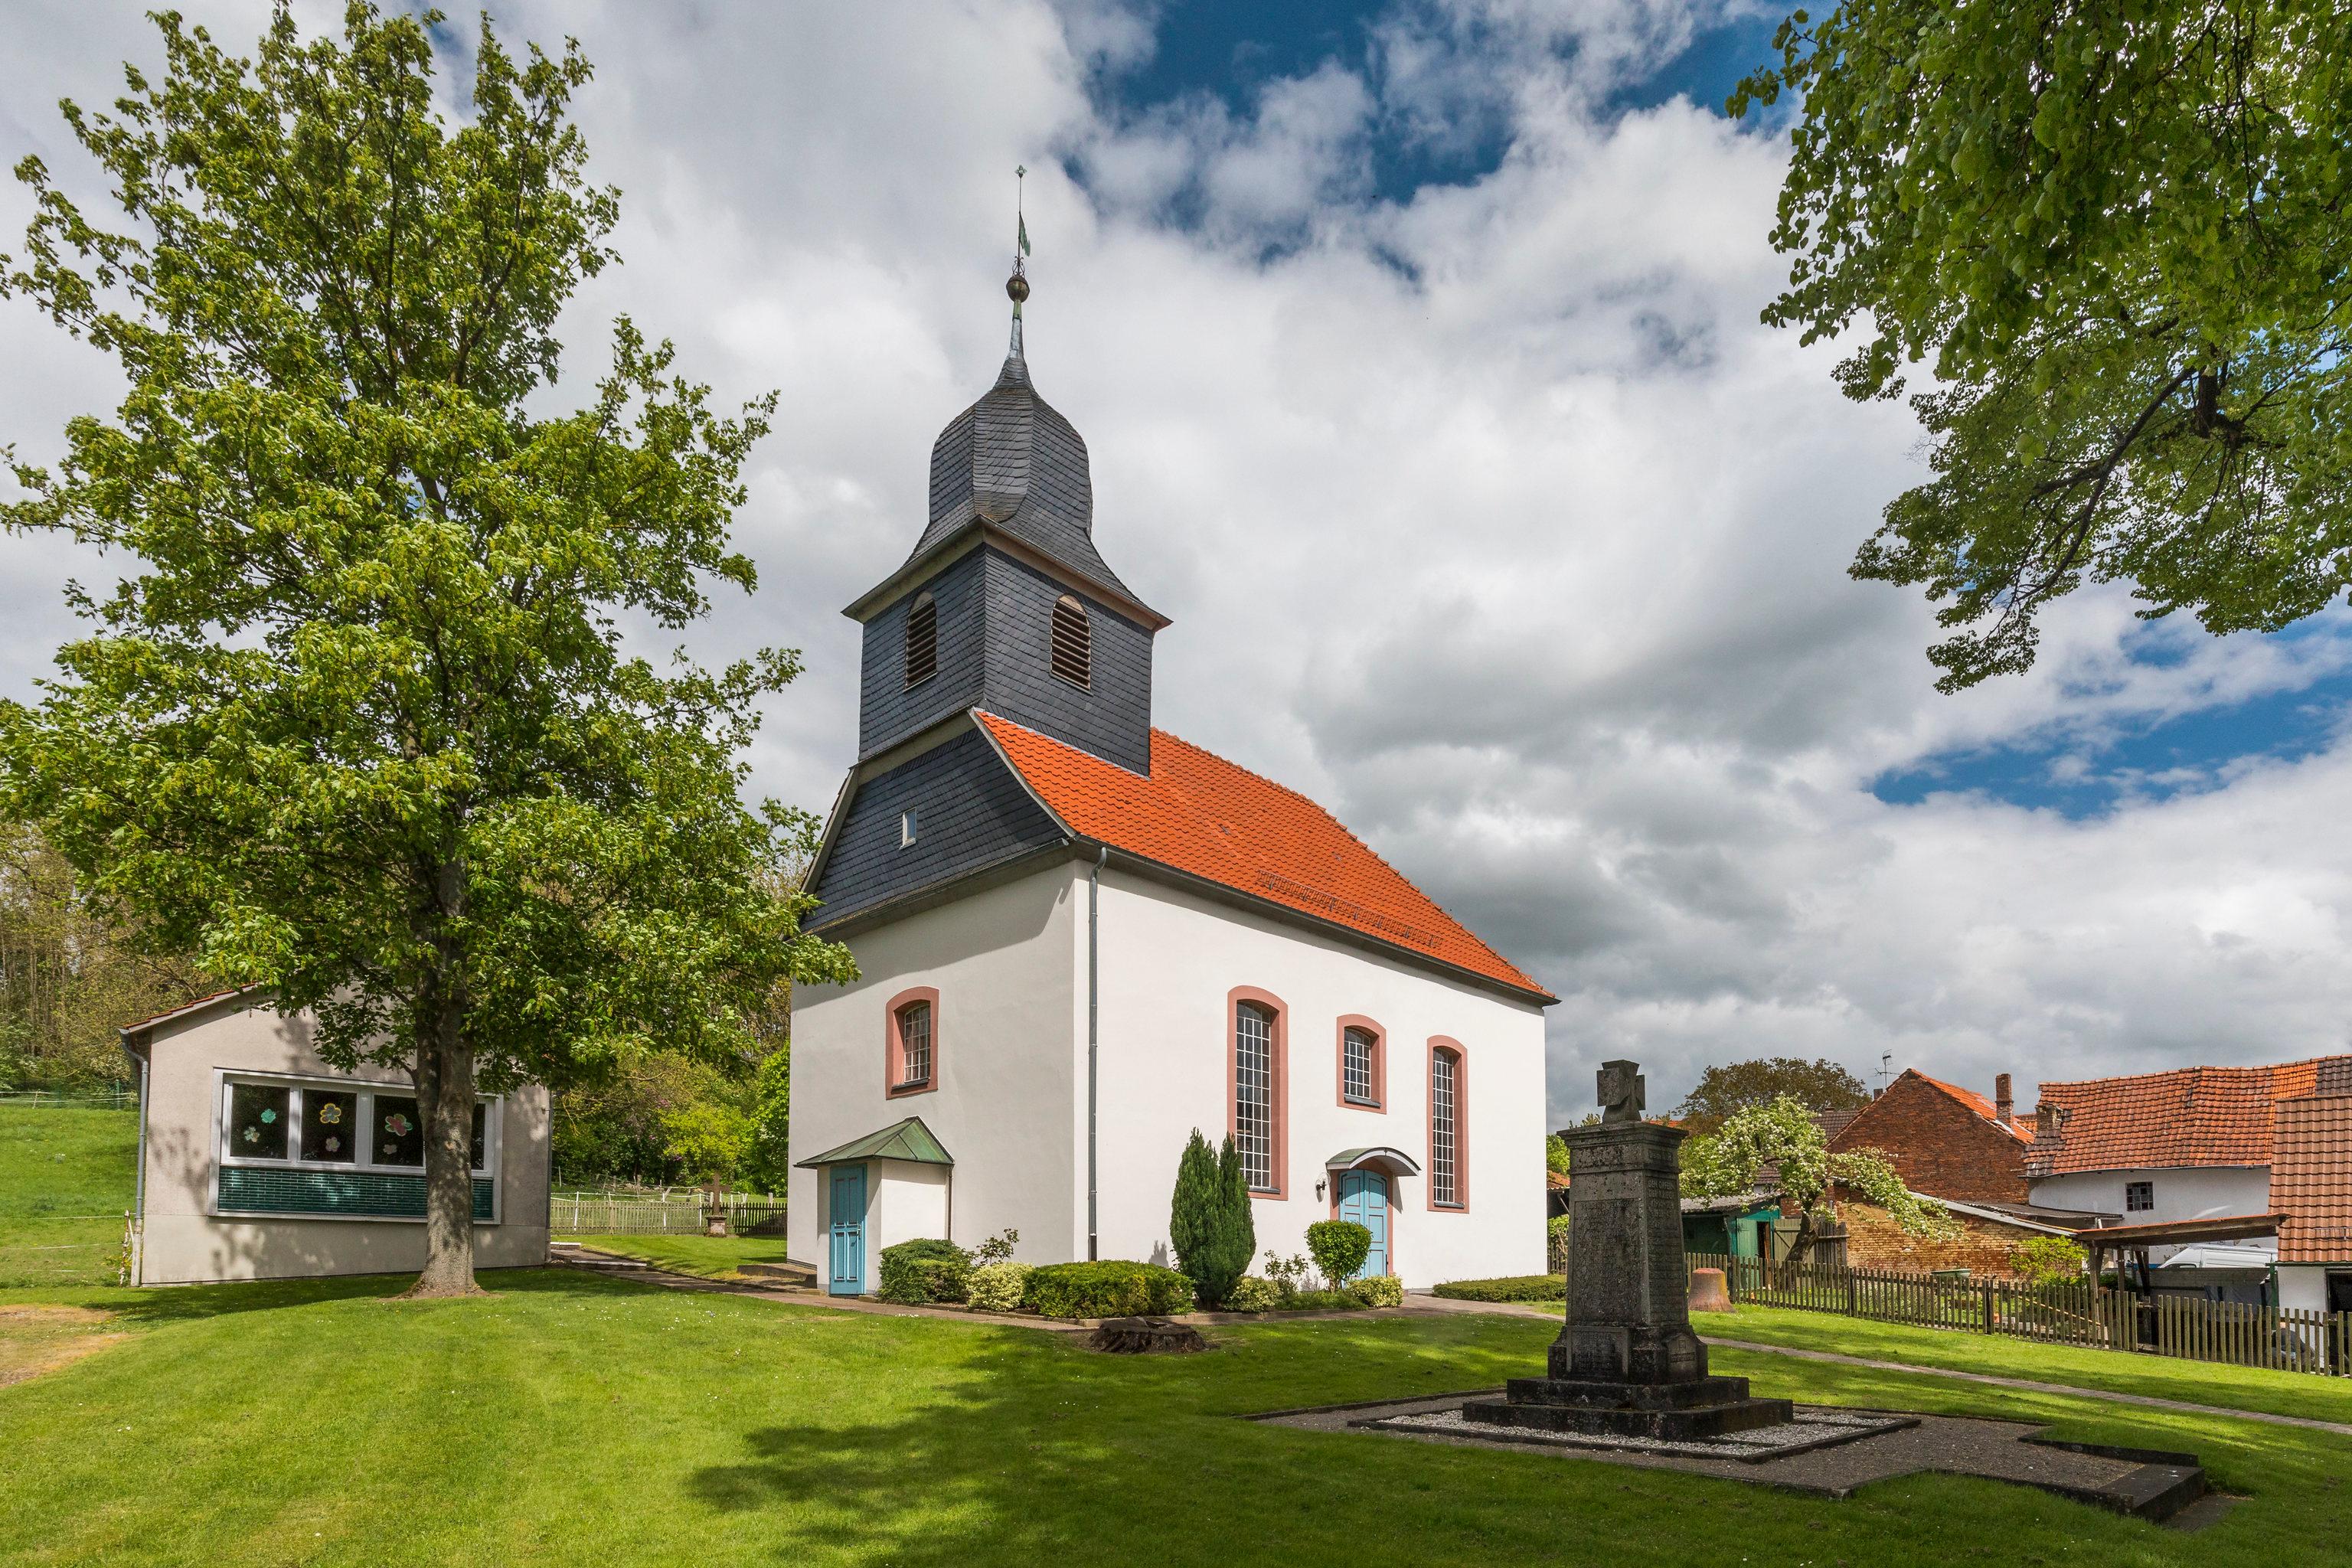 Desktop Wallpapers Church Germany Monuments Ersen Cities